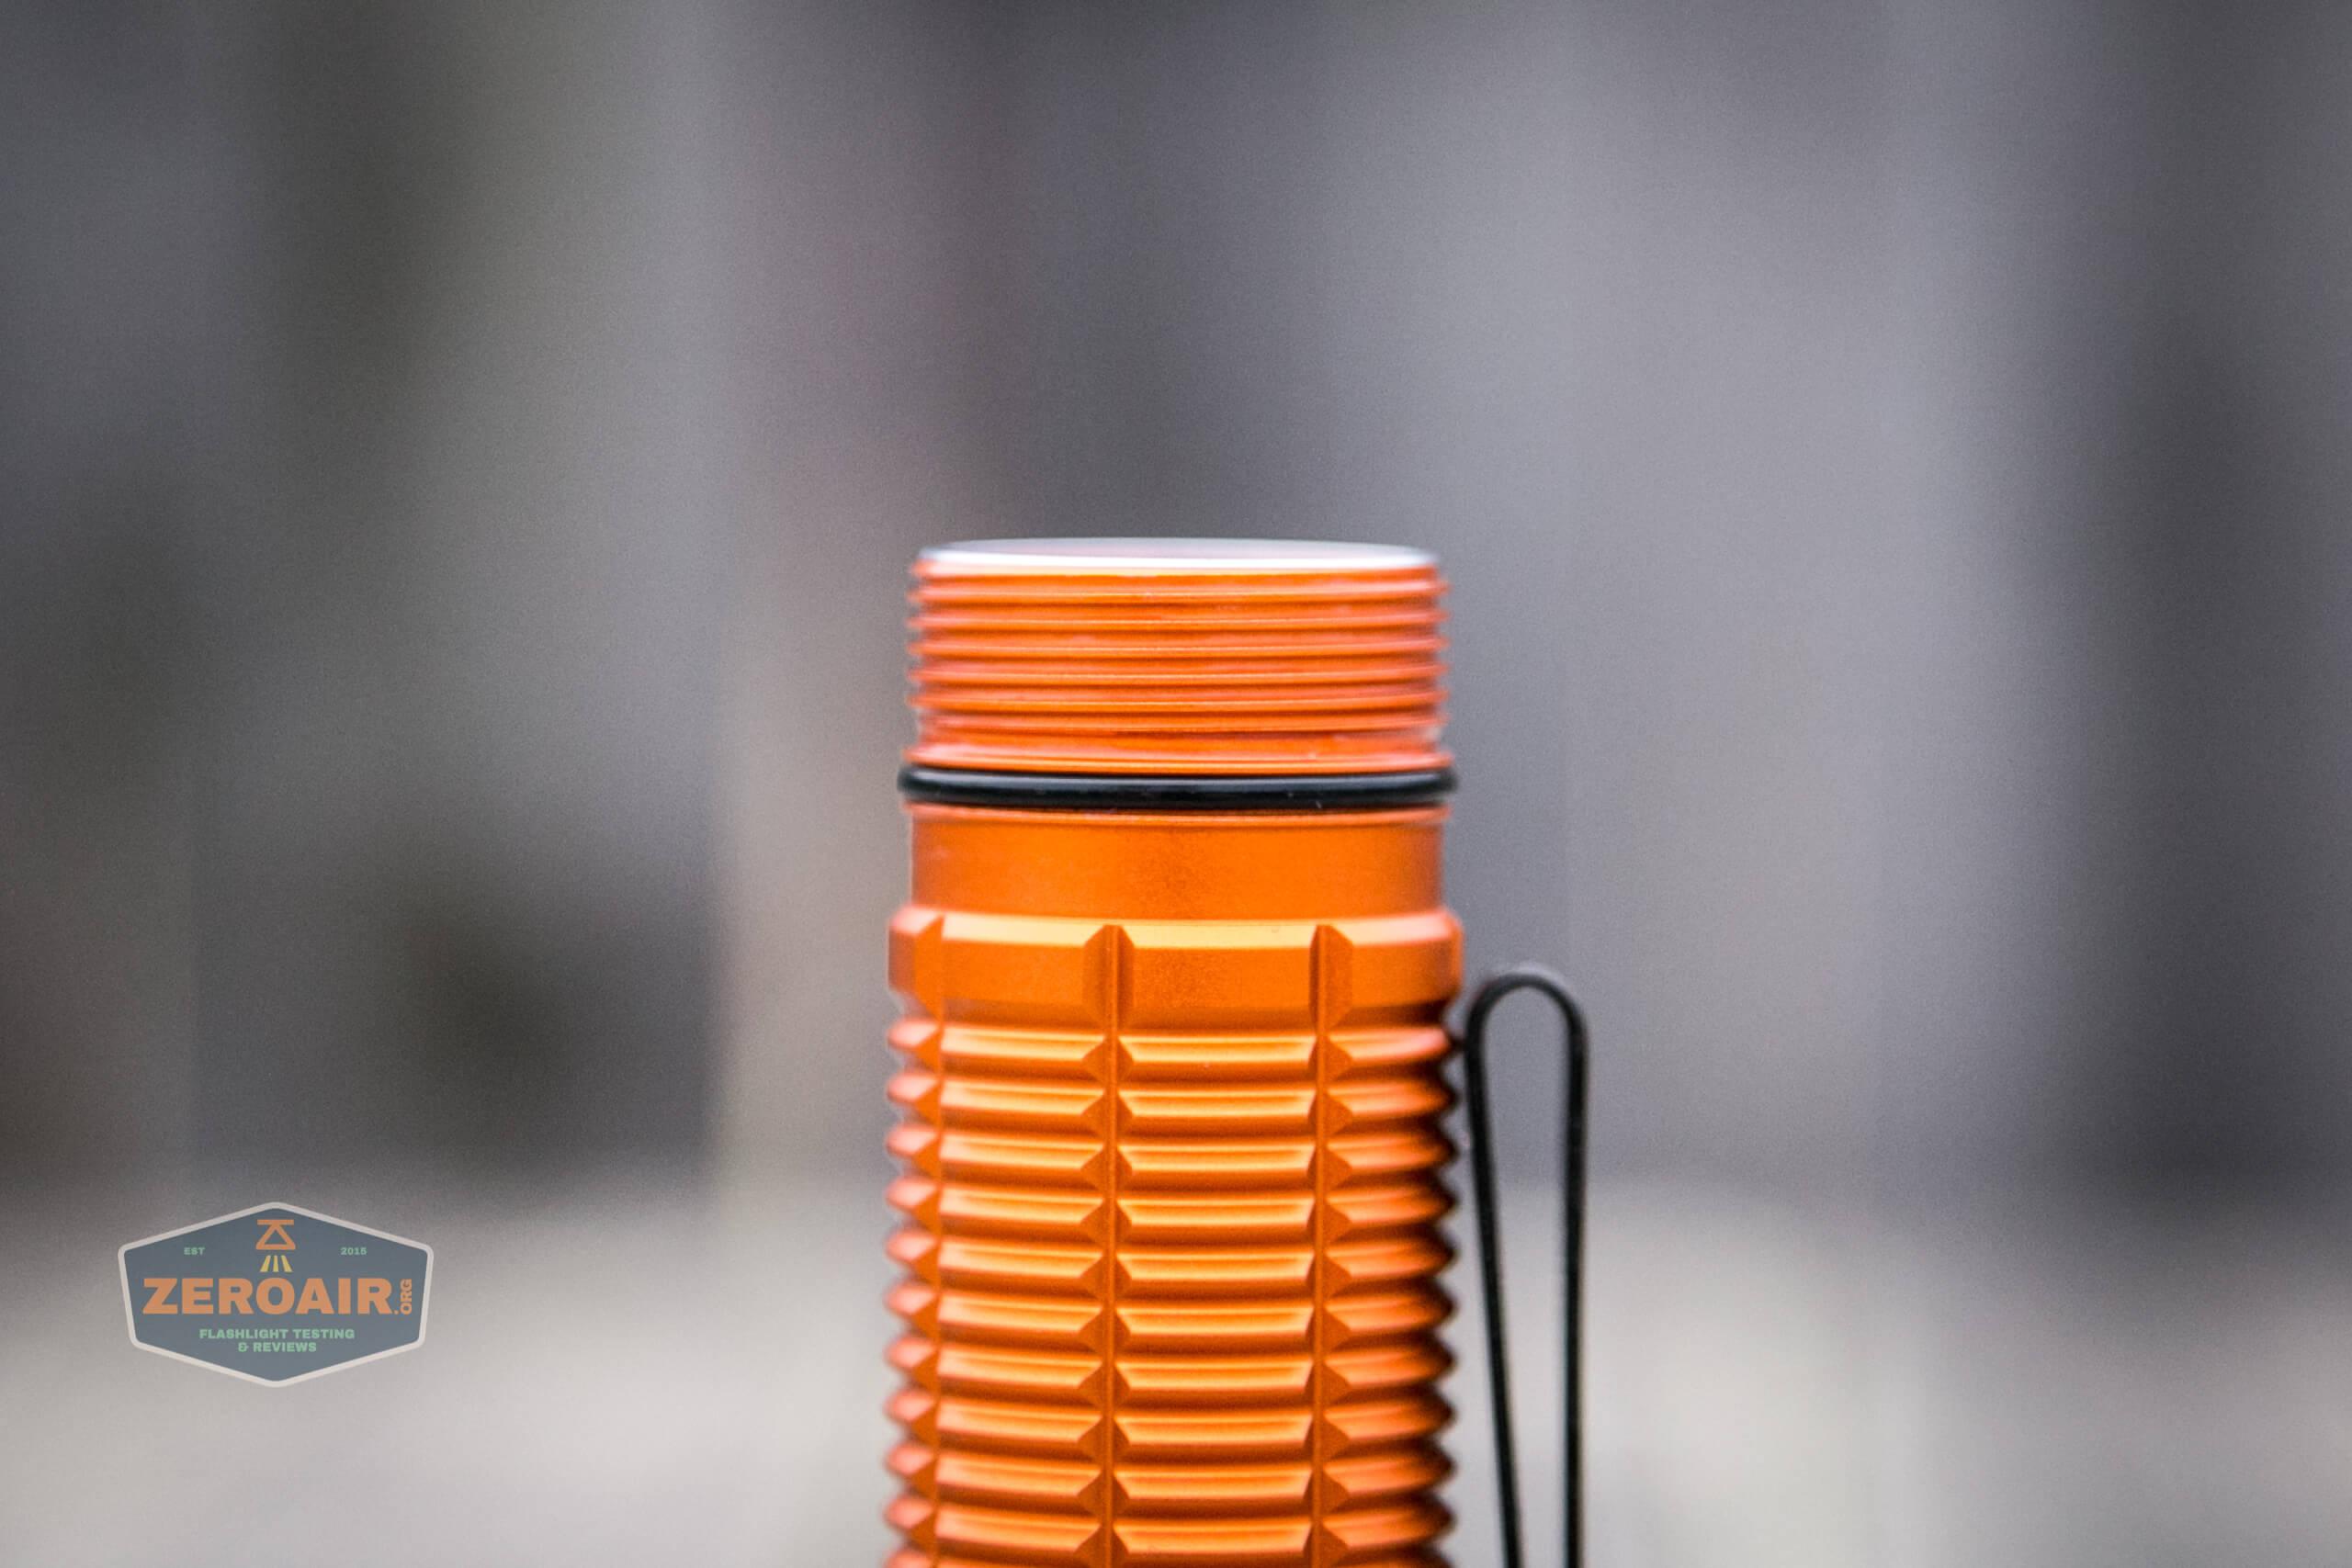 Olight M2R Pro Warrior Orange tailcap off